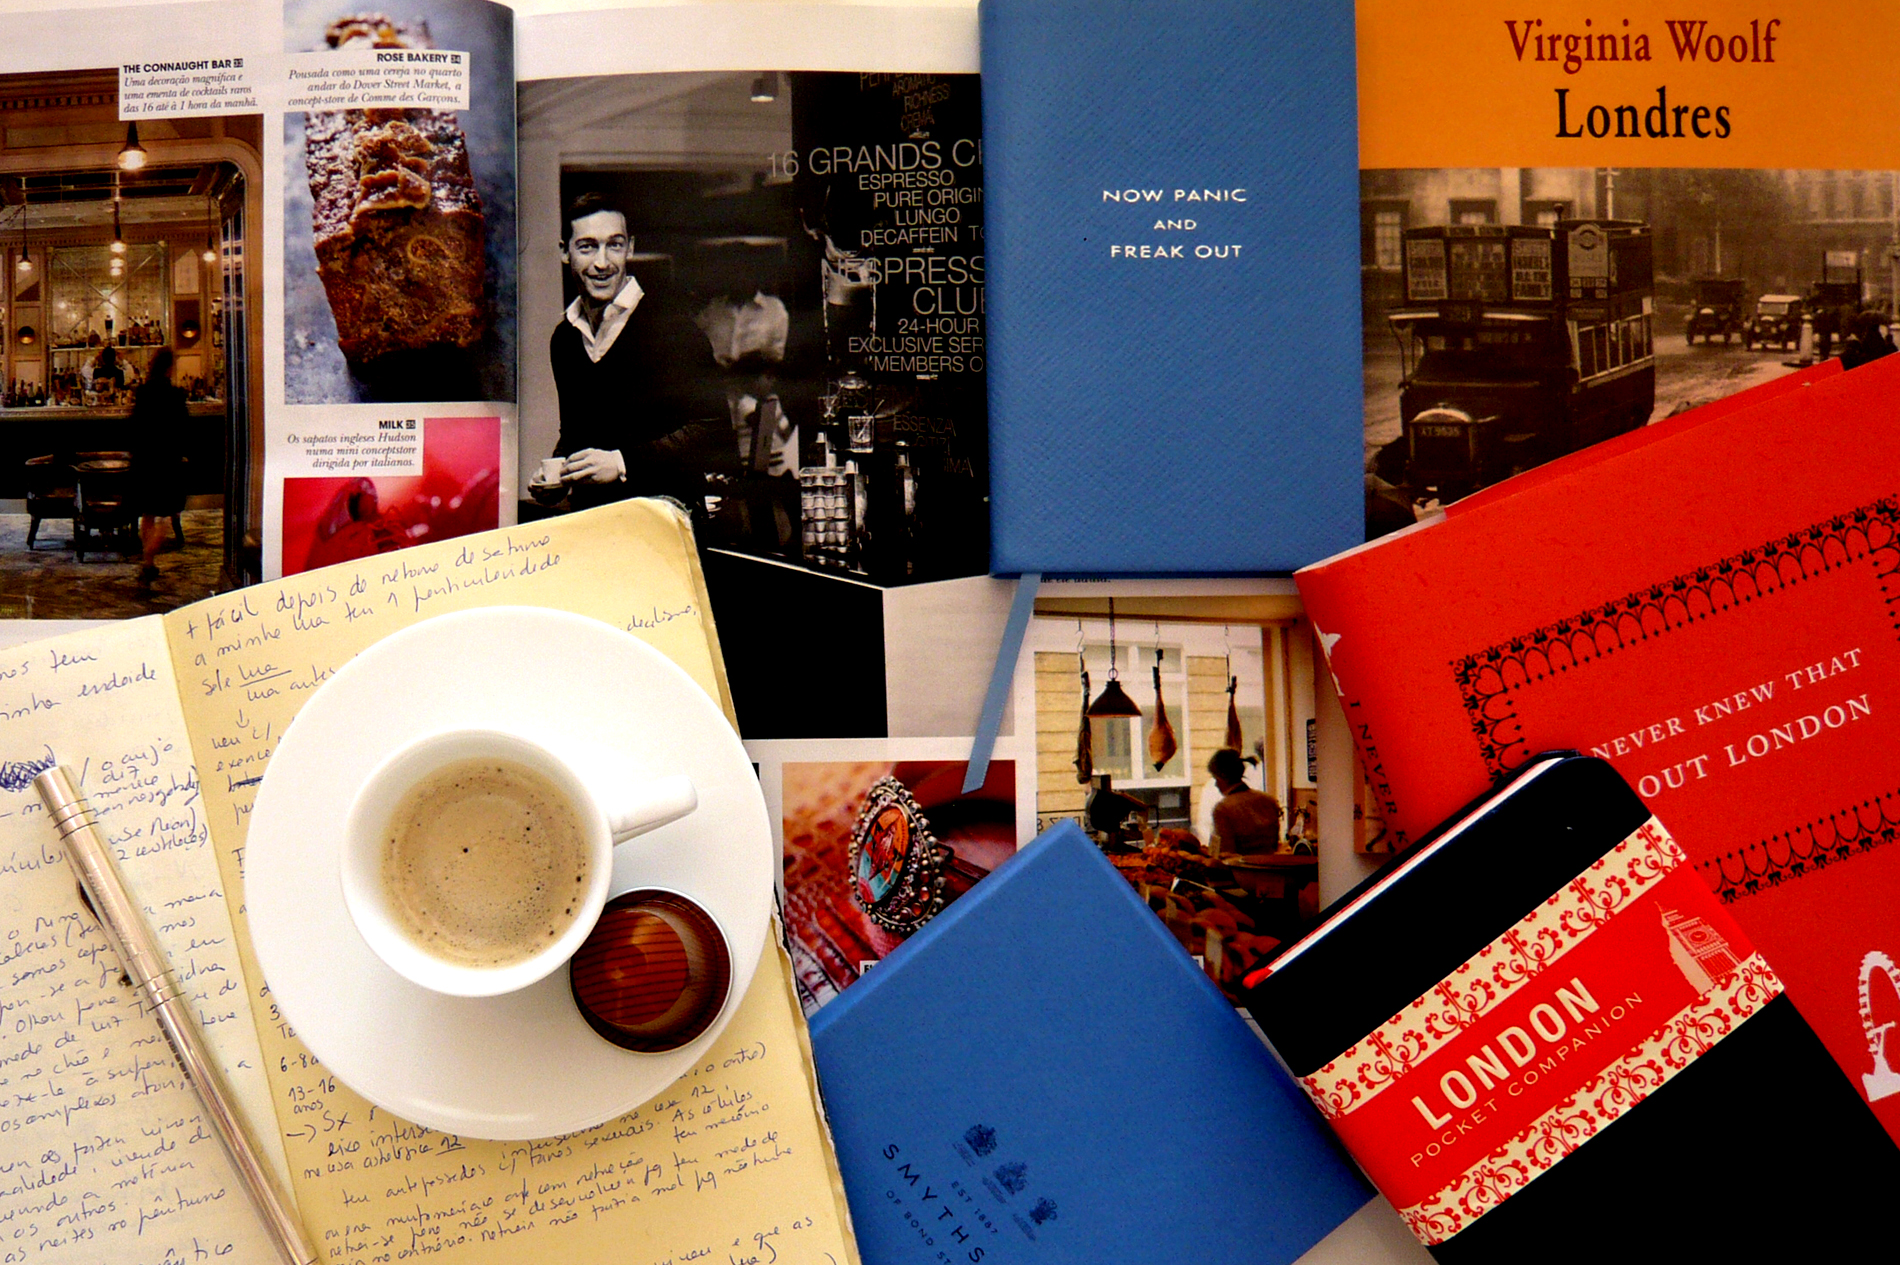 Café © Crónica Londres para Económico Sancha Trindade